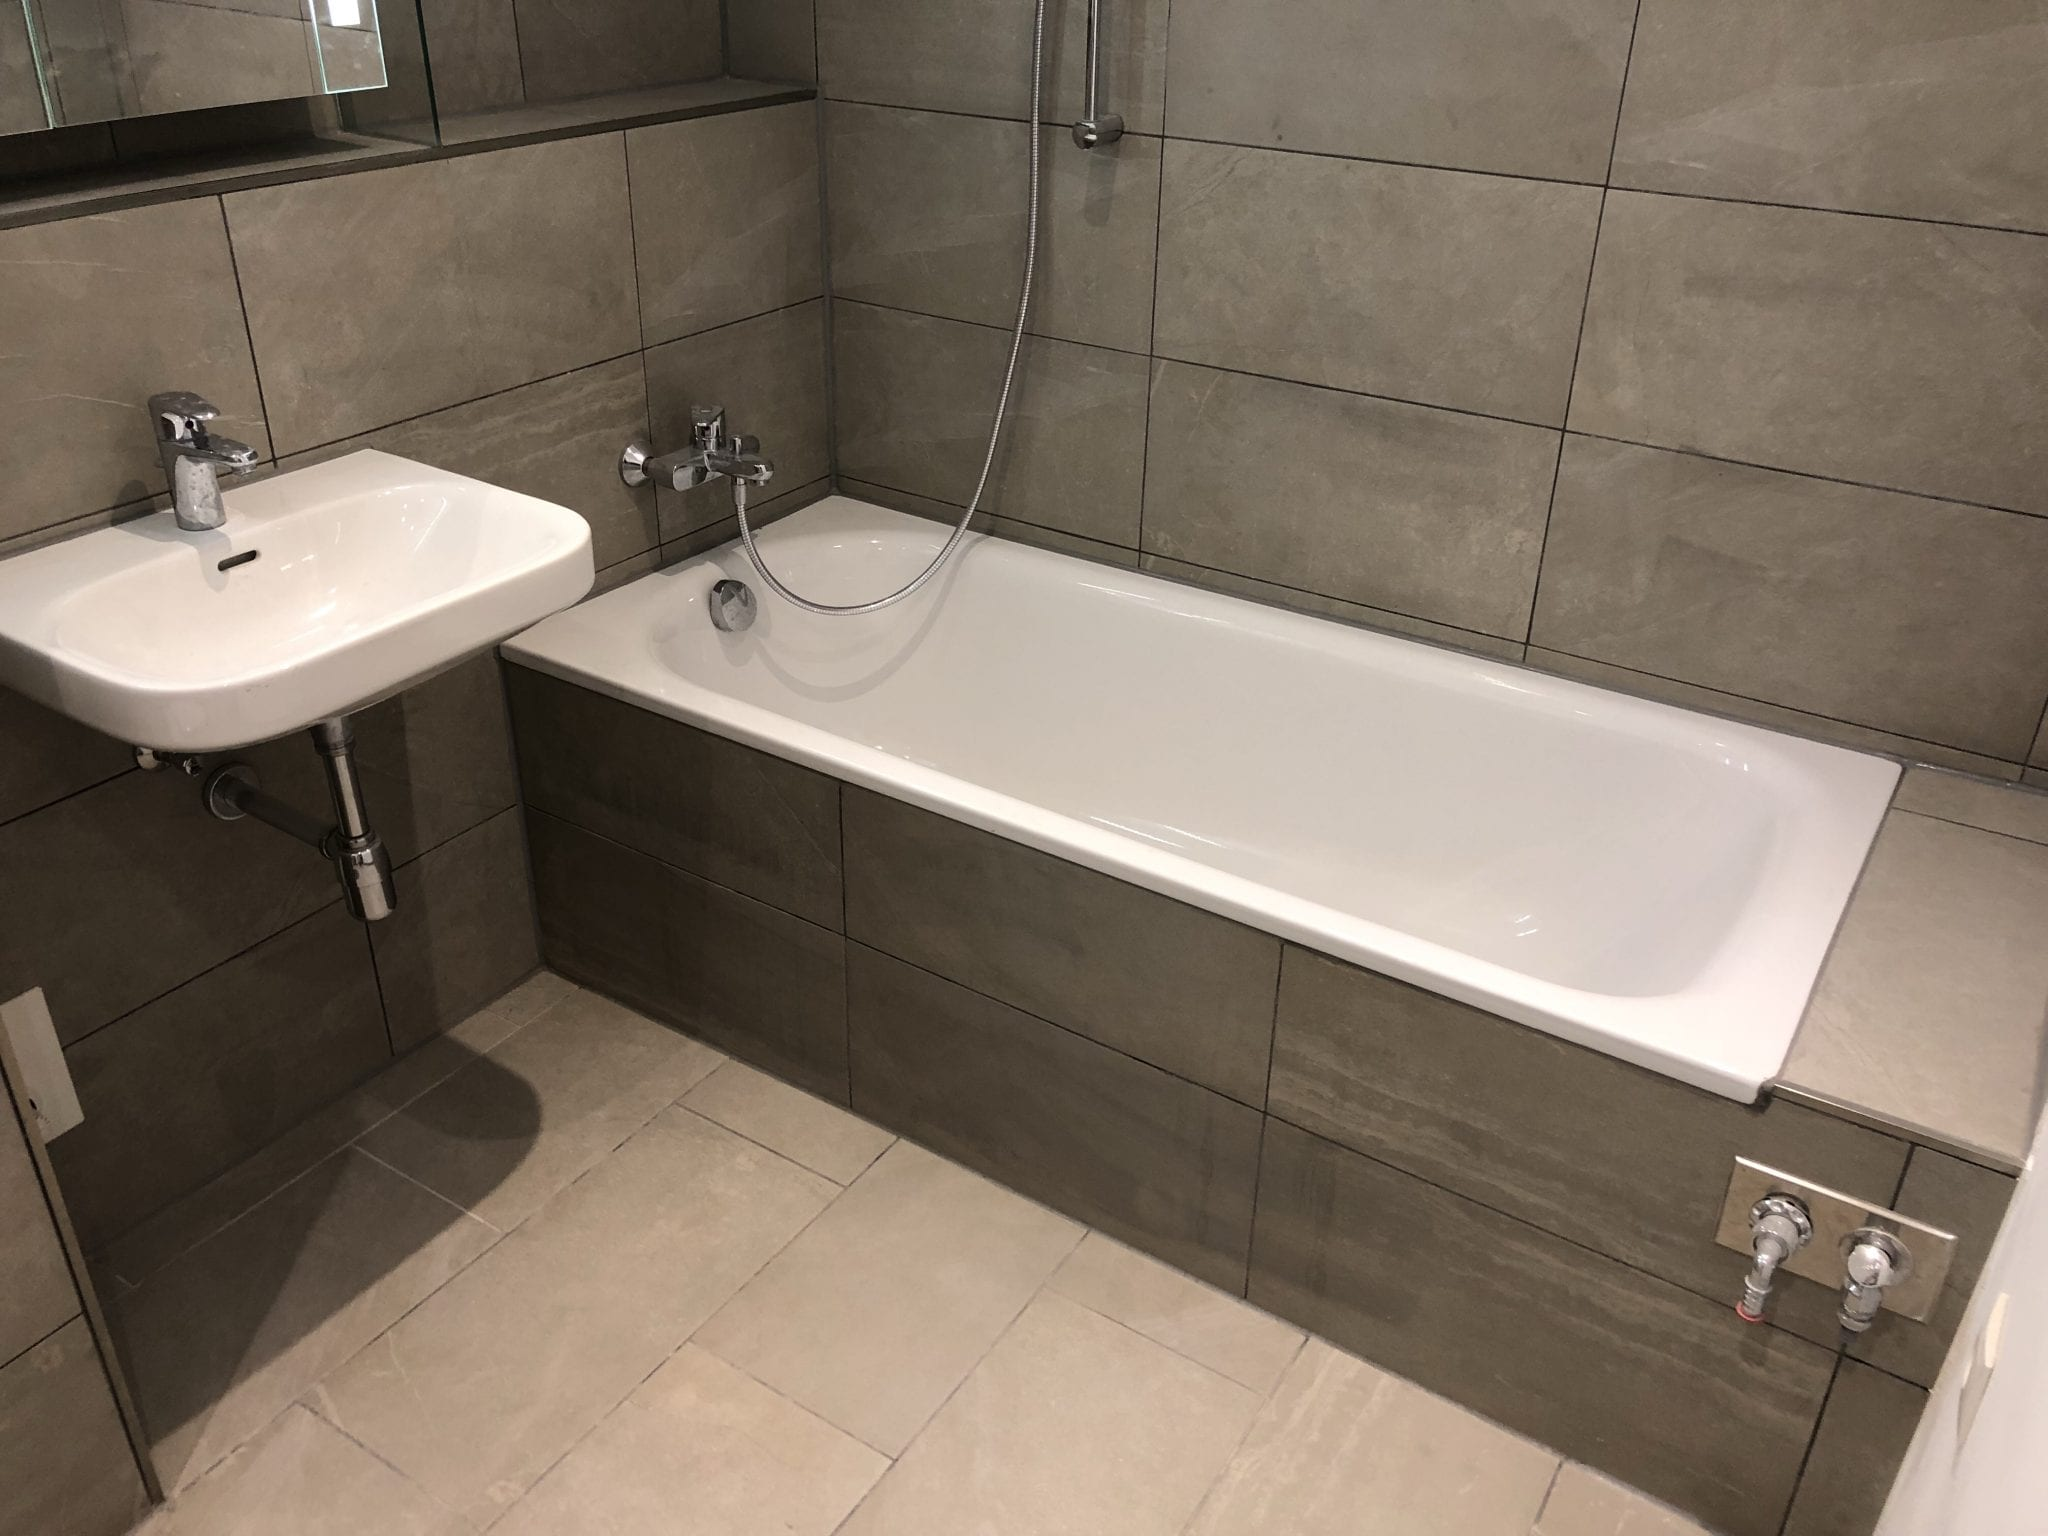 Badezimmer sanierung cheap badezimmer sanierung malente for Bad komplettsanierung